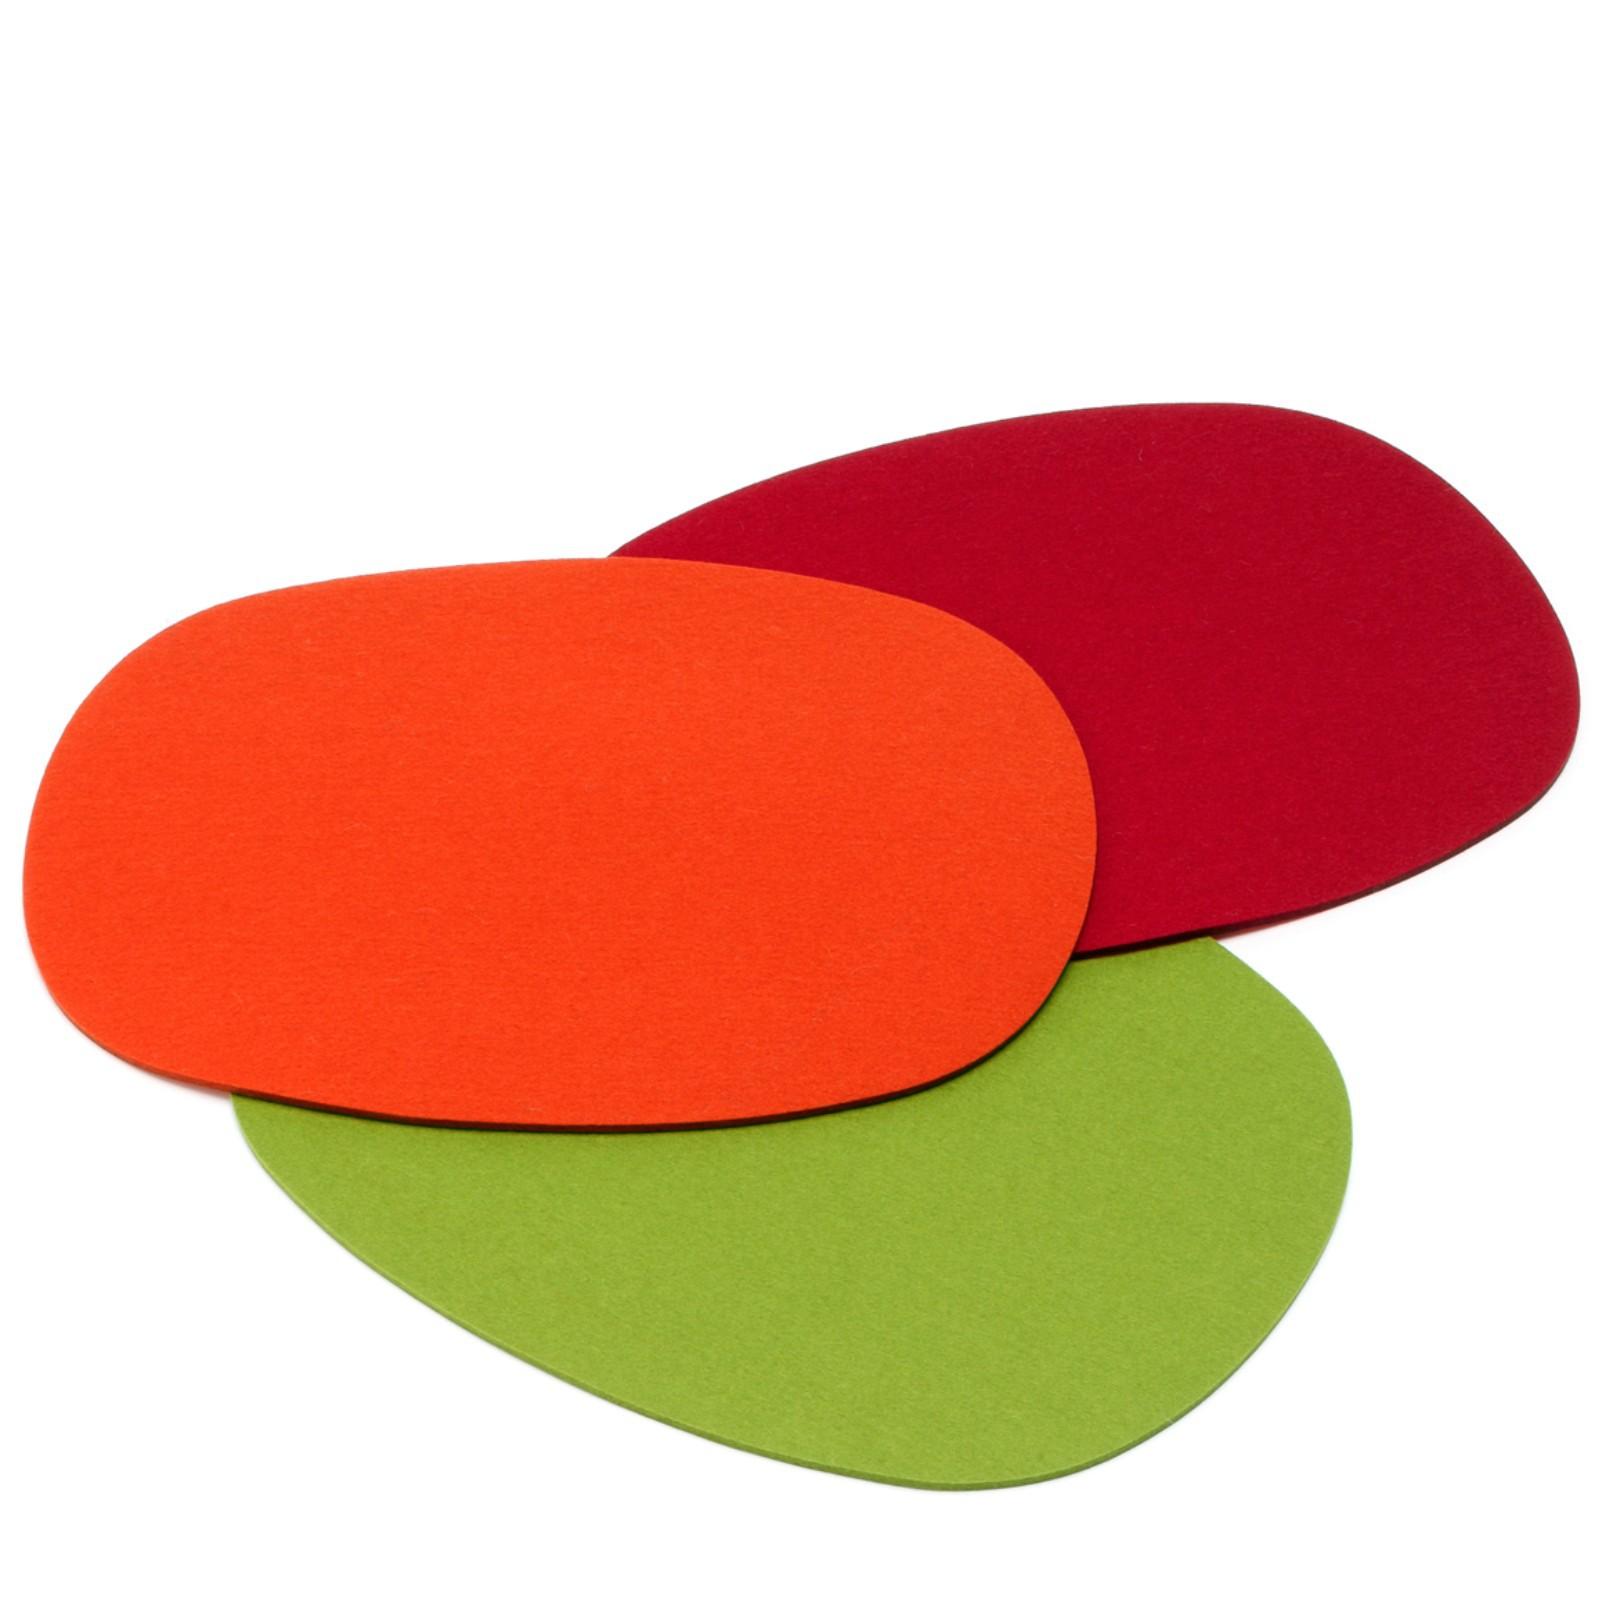 tischset filz 5 mm oval 8 teilig in vielen farben hey sign. Black Bedroom Furniture Sets. Home Design Ideas